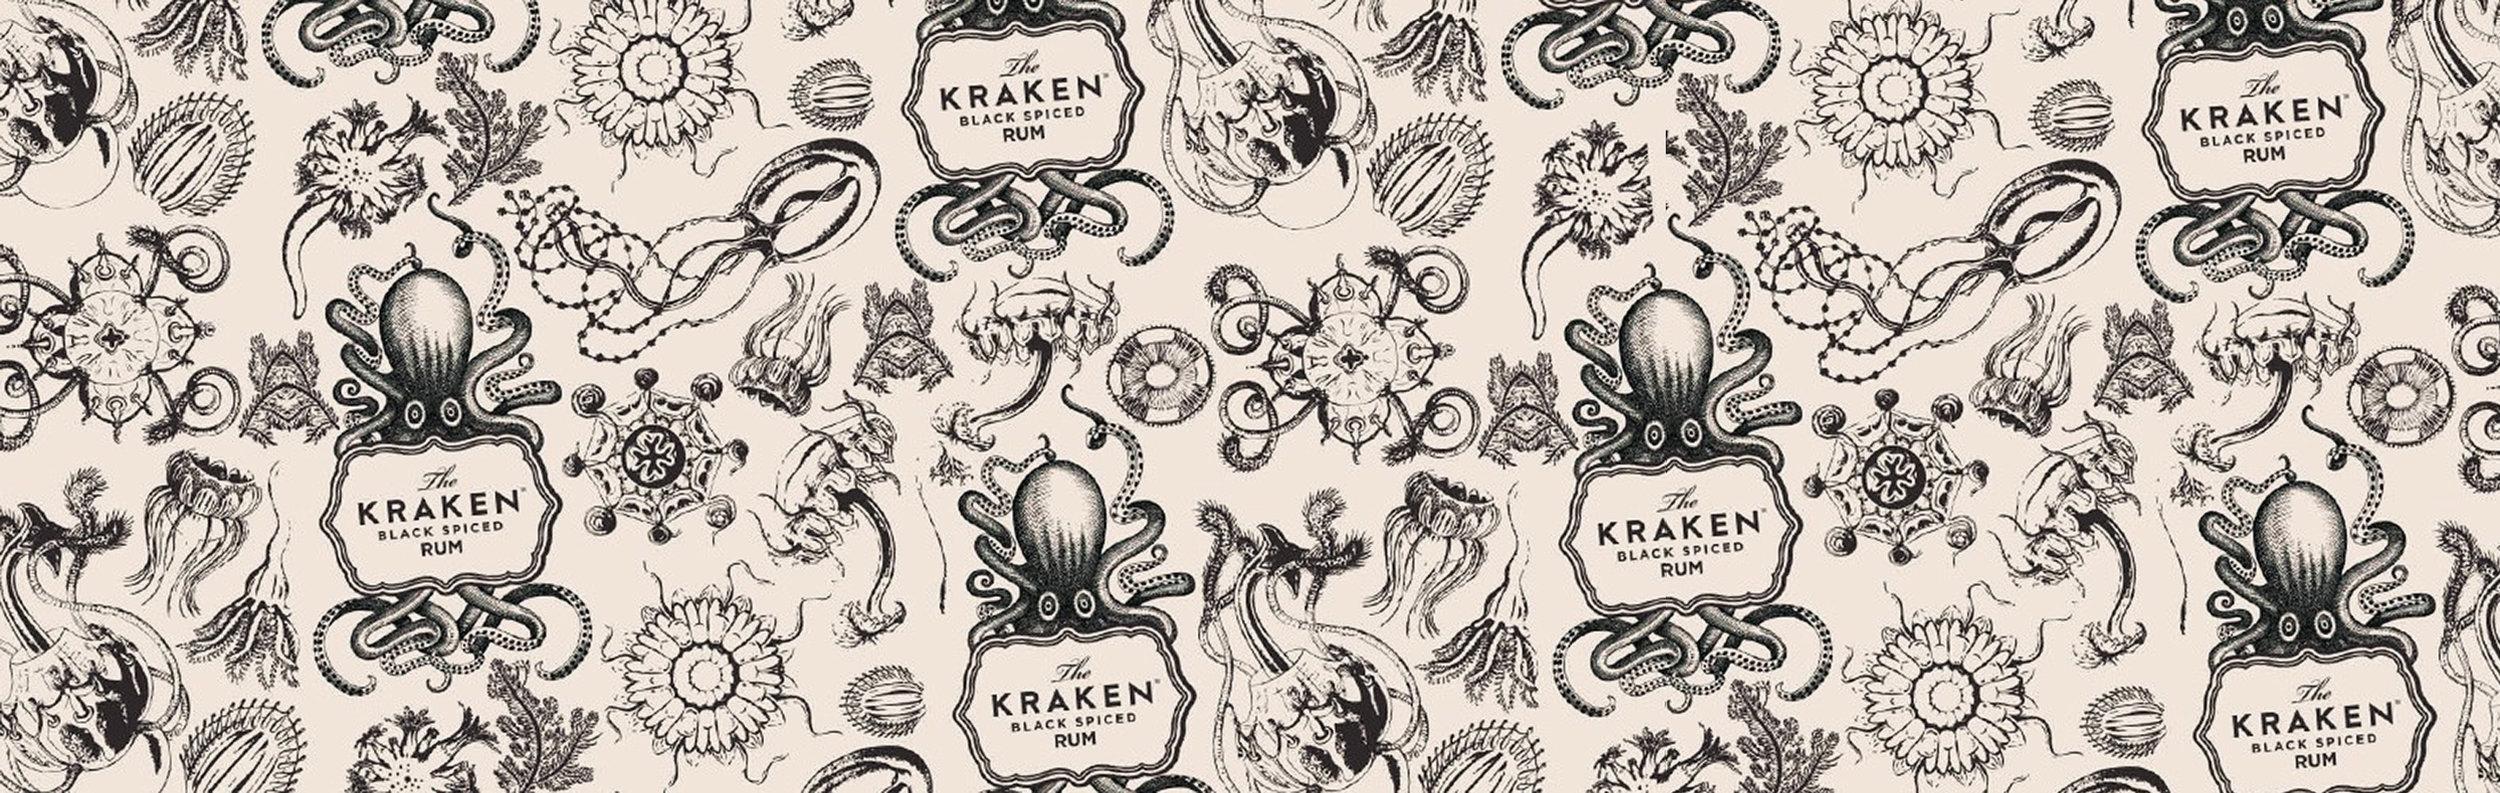 sra-kraken-black-spiced-rum-pattern.jpg